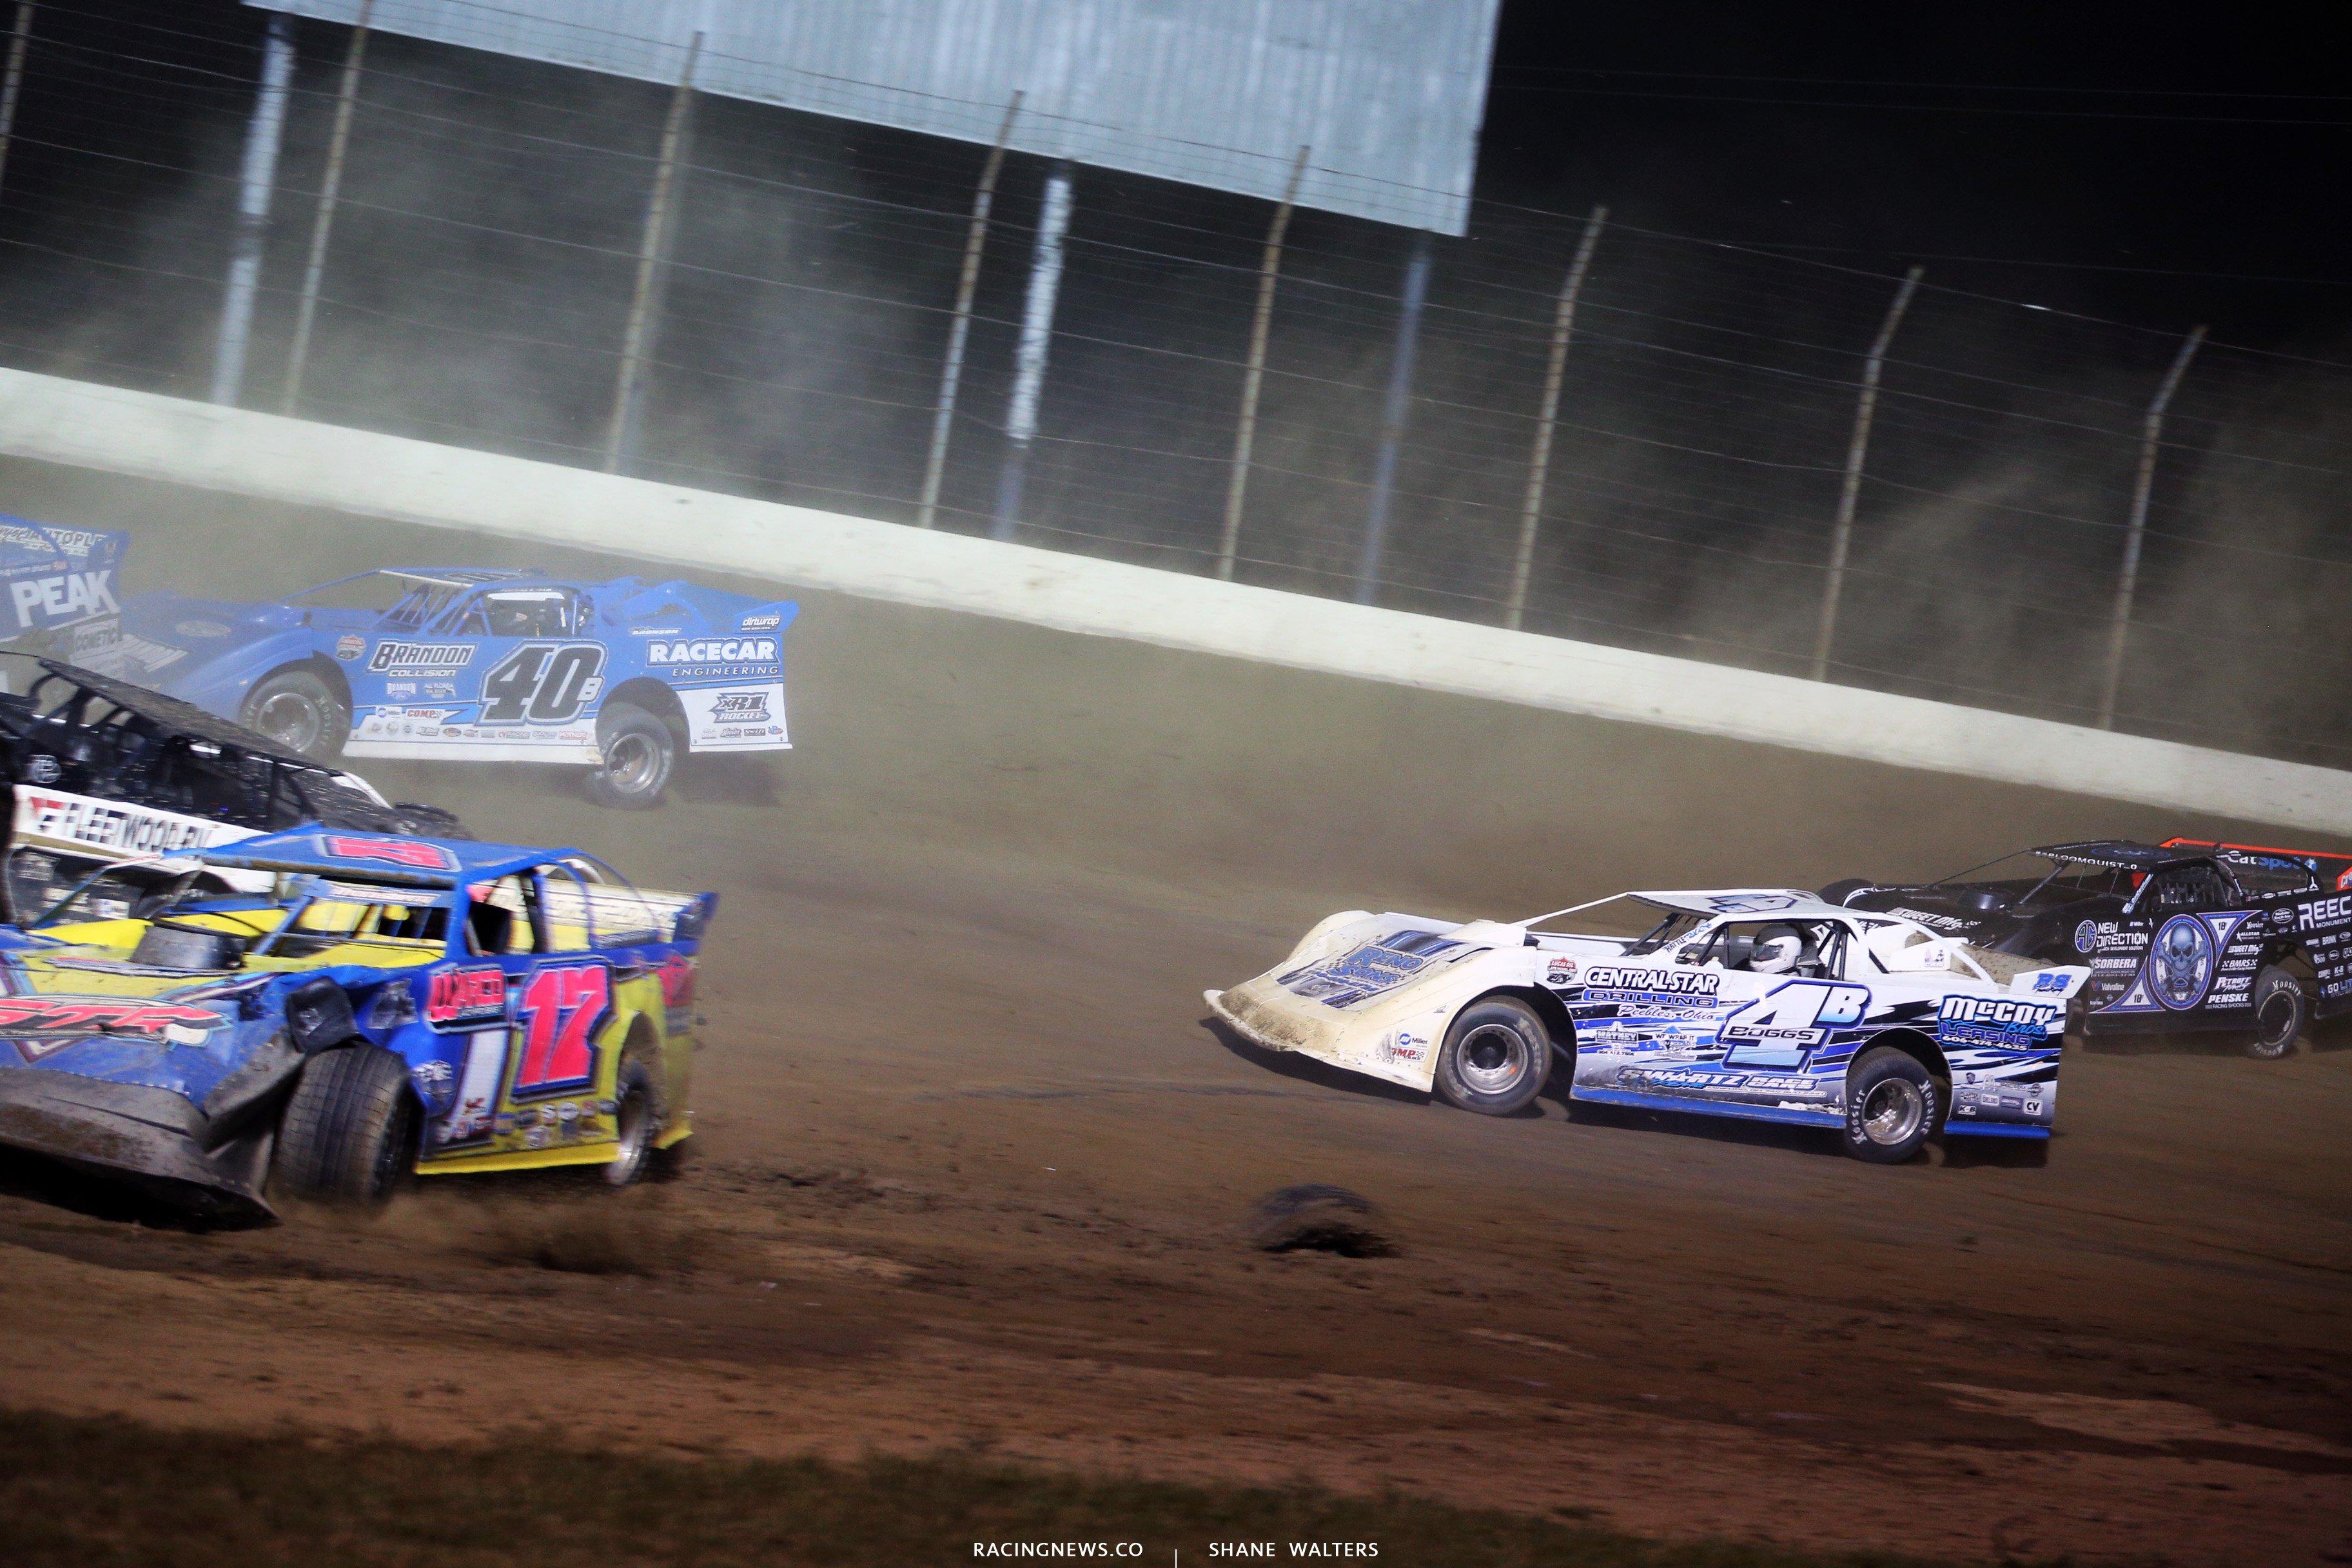 Kyle Bronson and Scott Bloomquist crash at Portsmouth Raceway Park 7388